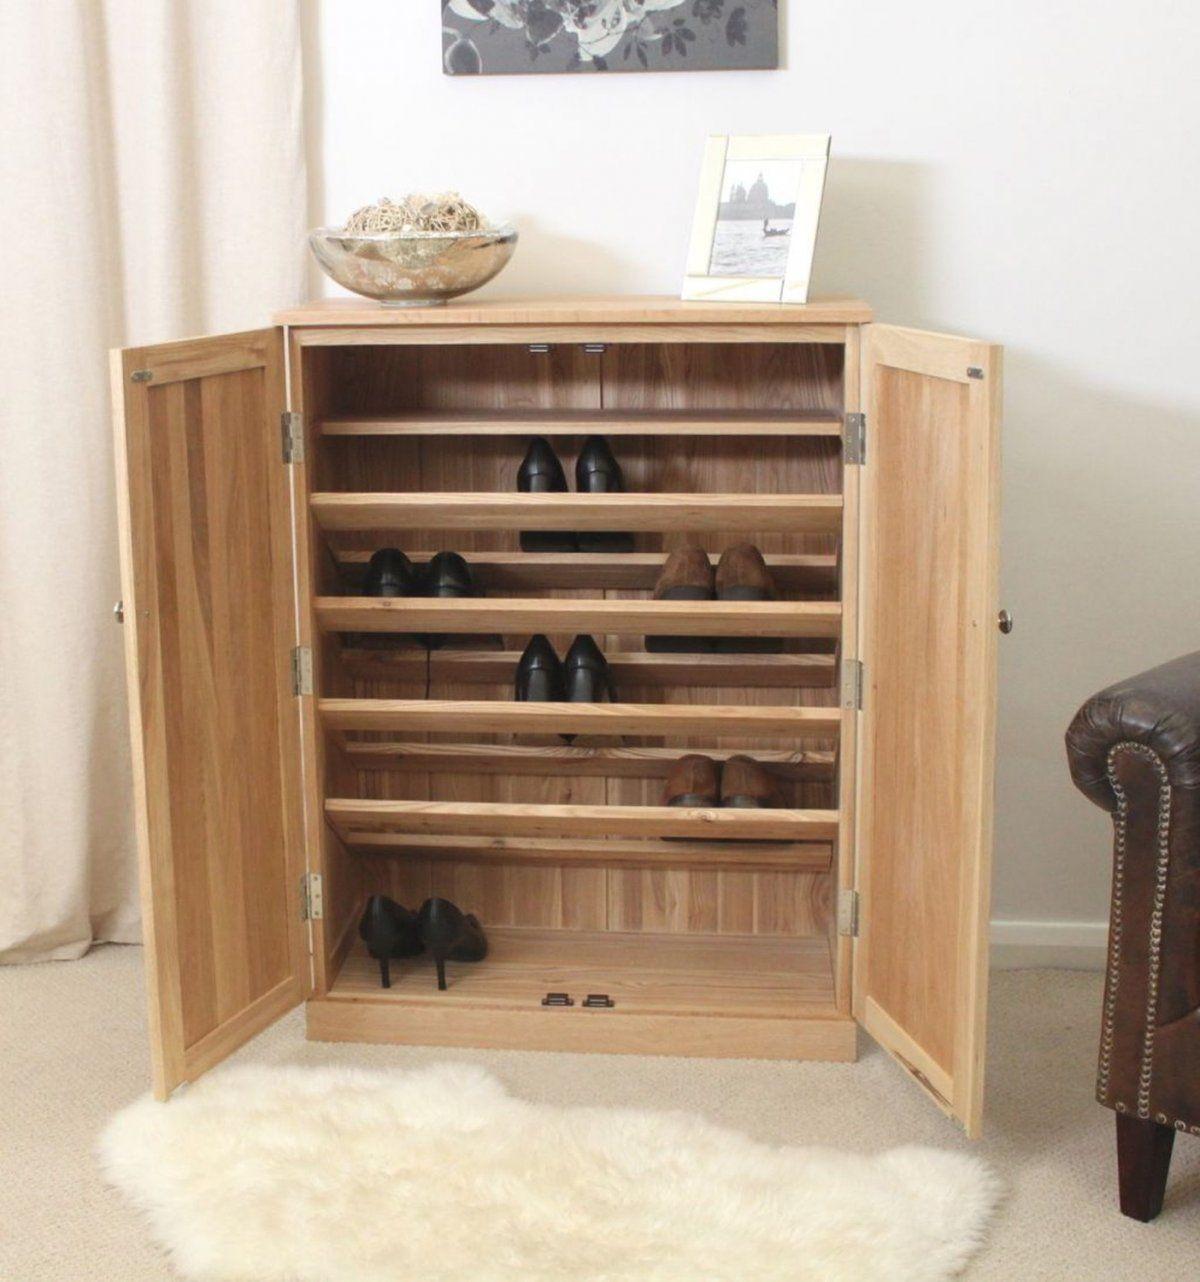 Homemade Shoe Rack Pinewood Cupboard Solutions For Modern Home Interior Ideas Jpg 1200 1282